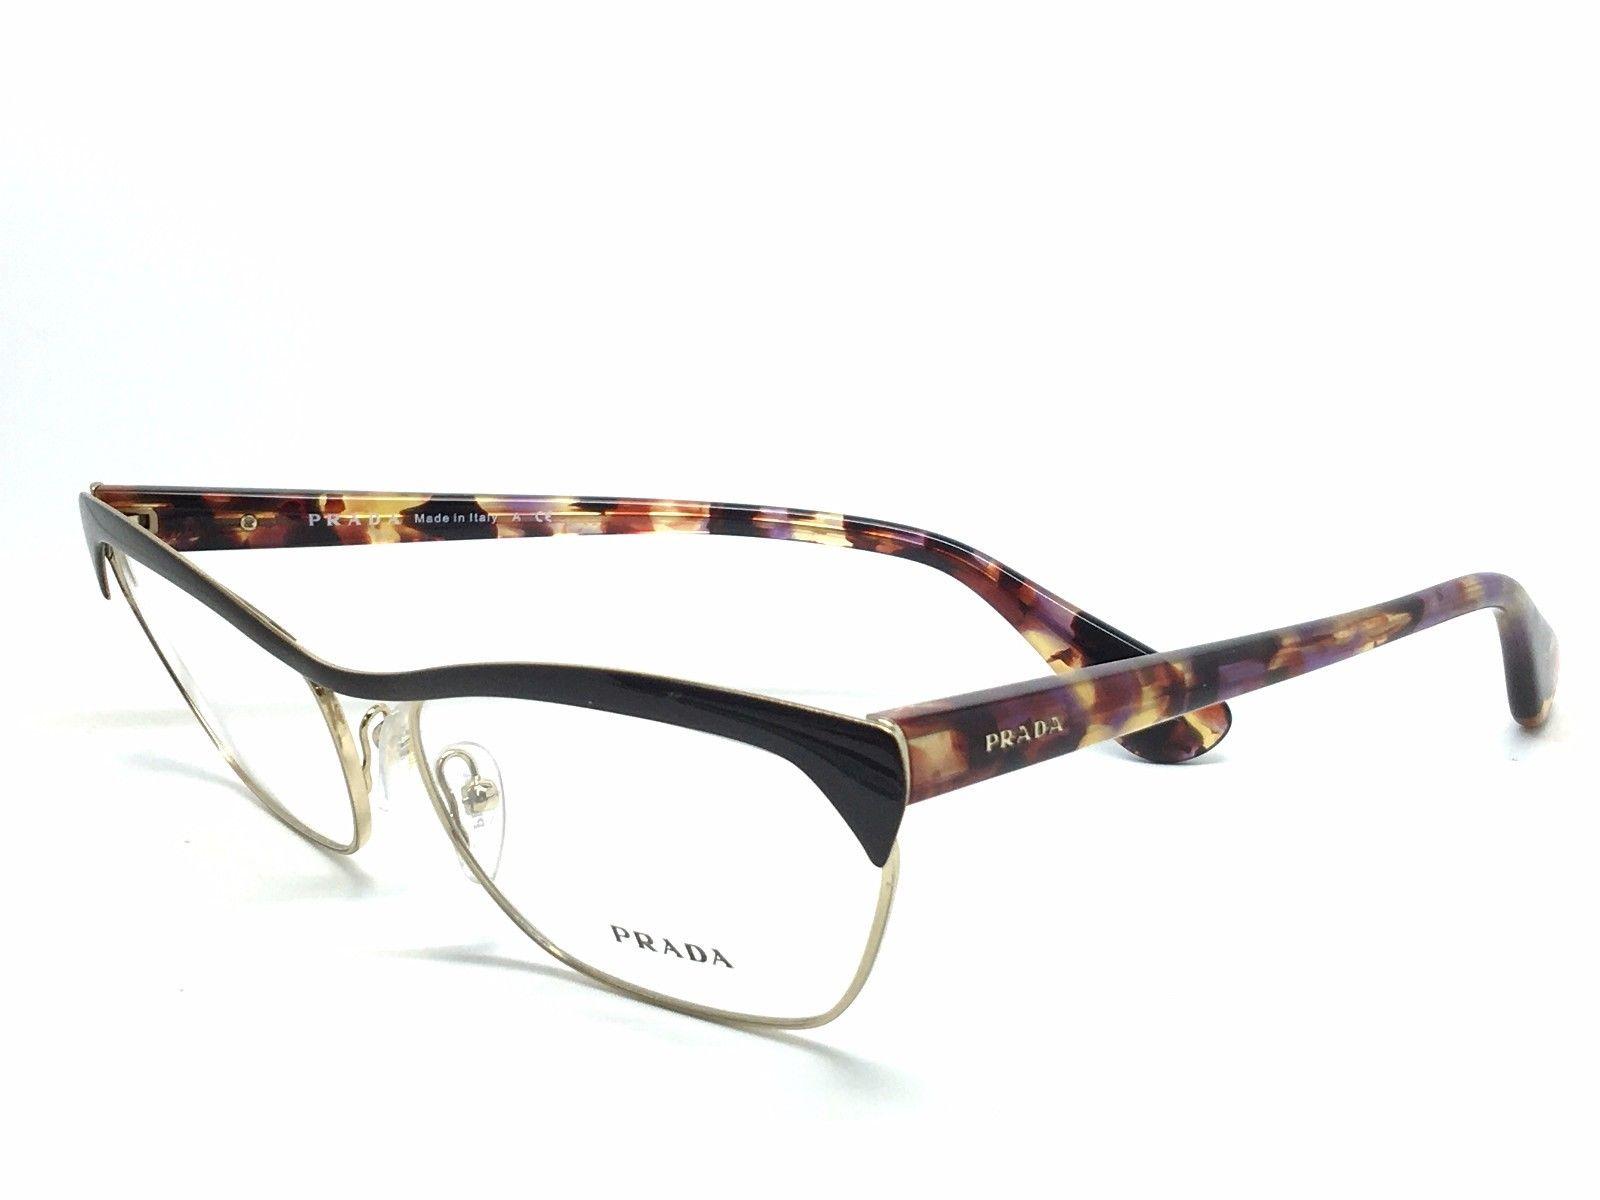 Prada Green Eyeglass Frames : New PRADA VPR57Q PR57QV QE6-1O1 Authentic Eyeglasses Frame